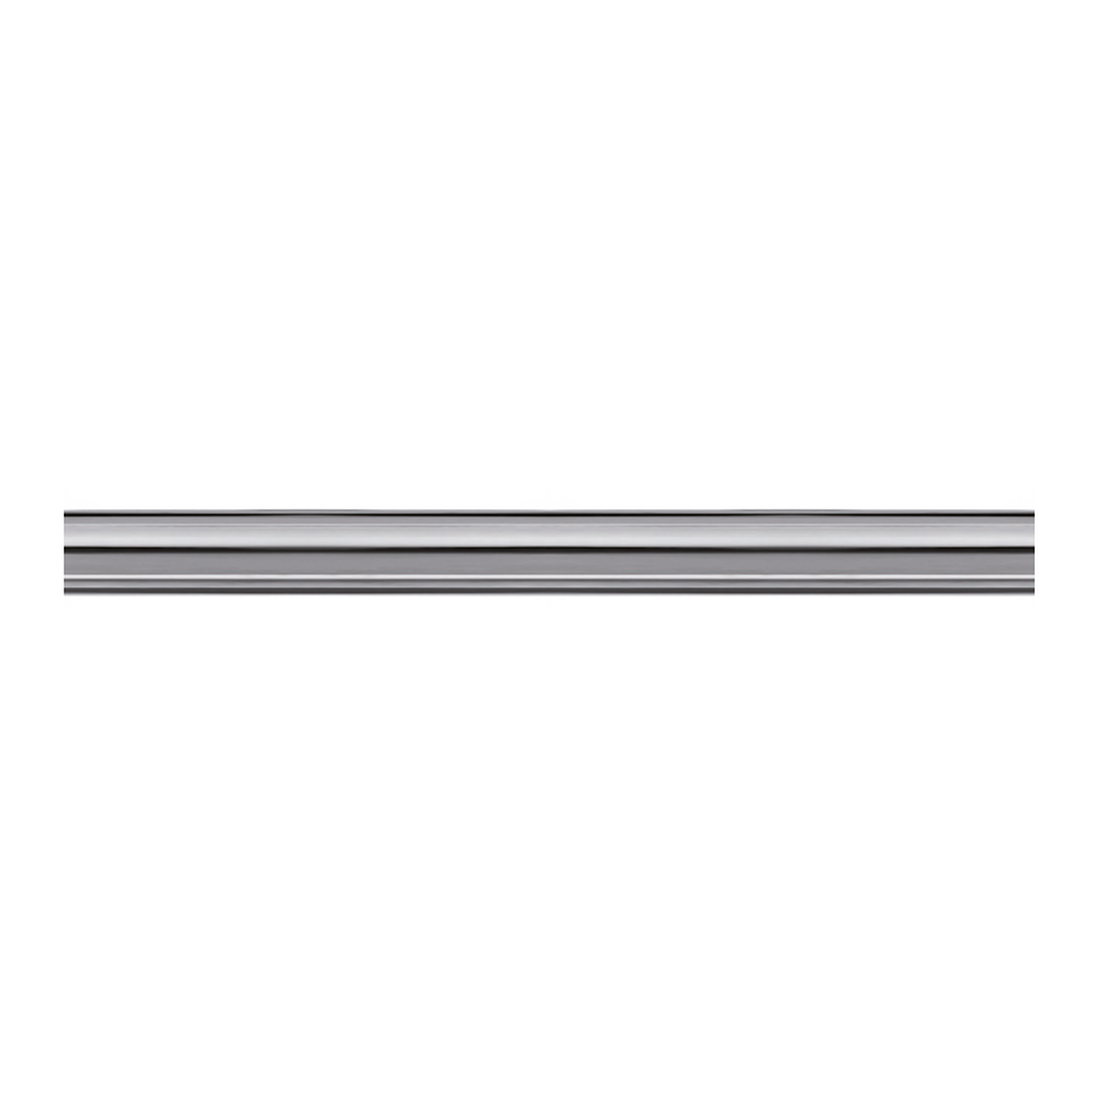 STABILISATIONS-SET, 1500MM, EDELSTAHL FEINSCHLIFF